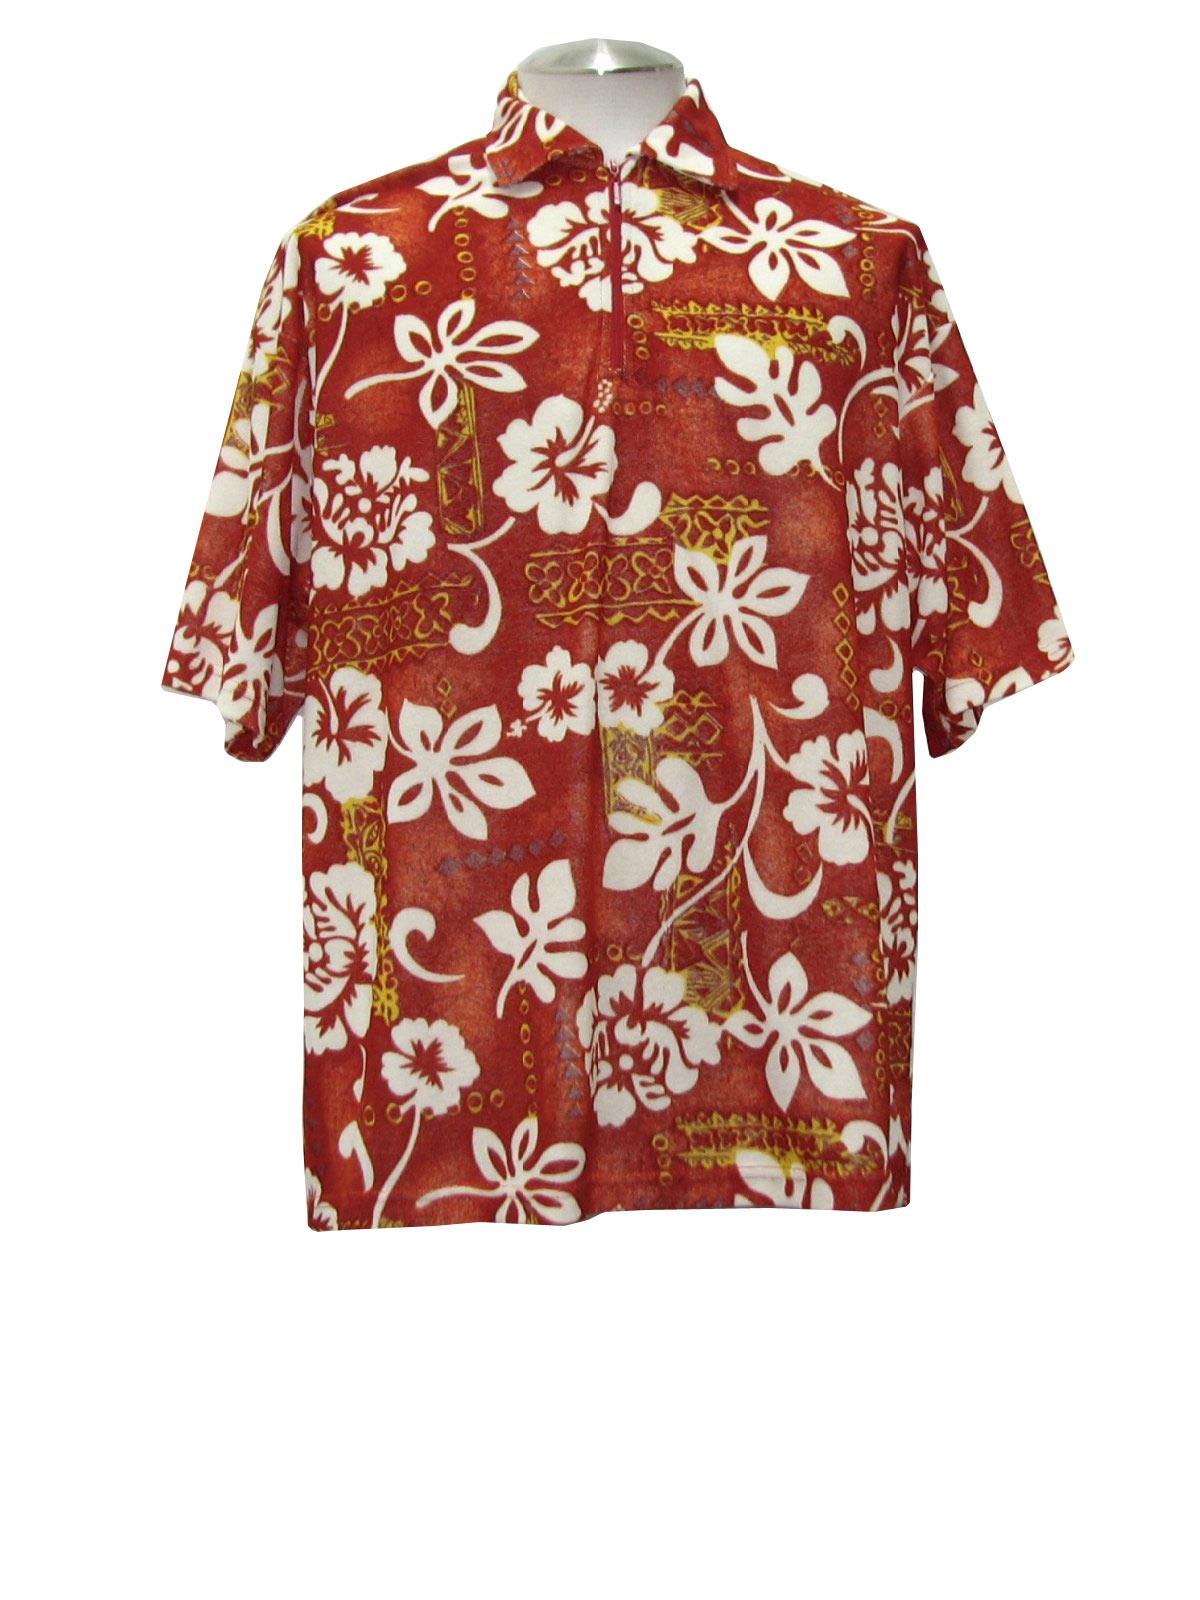 Kennington 80's Vintage Hawaiian Shirt: 80s style (made more ...